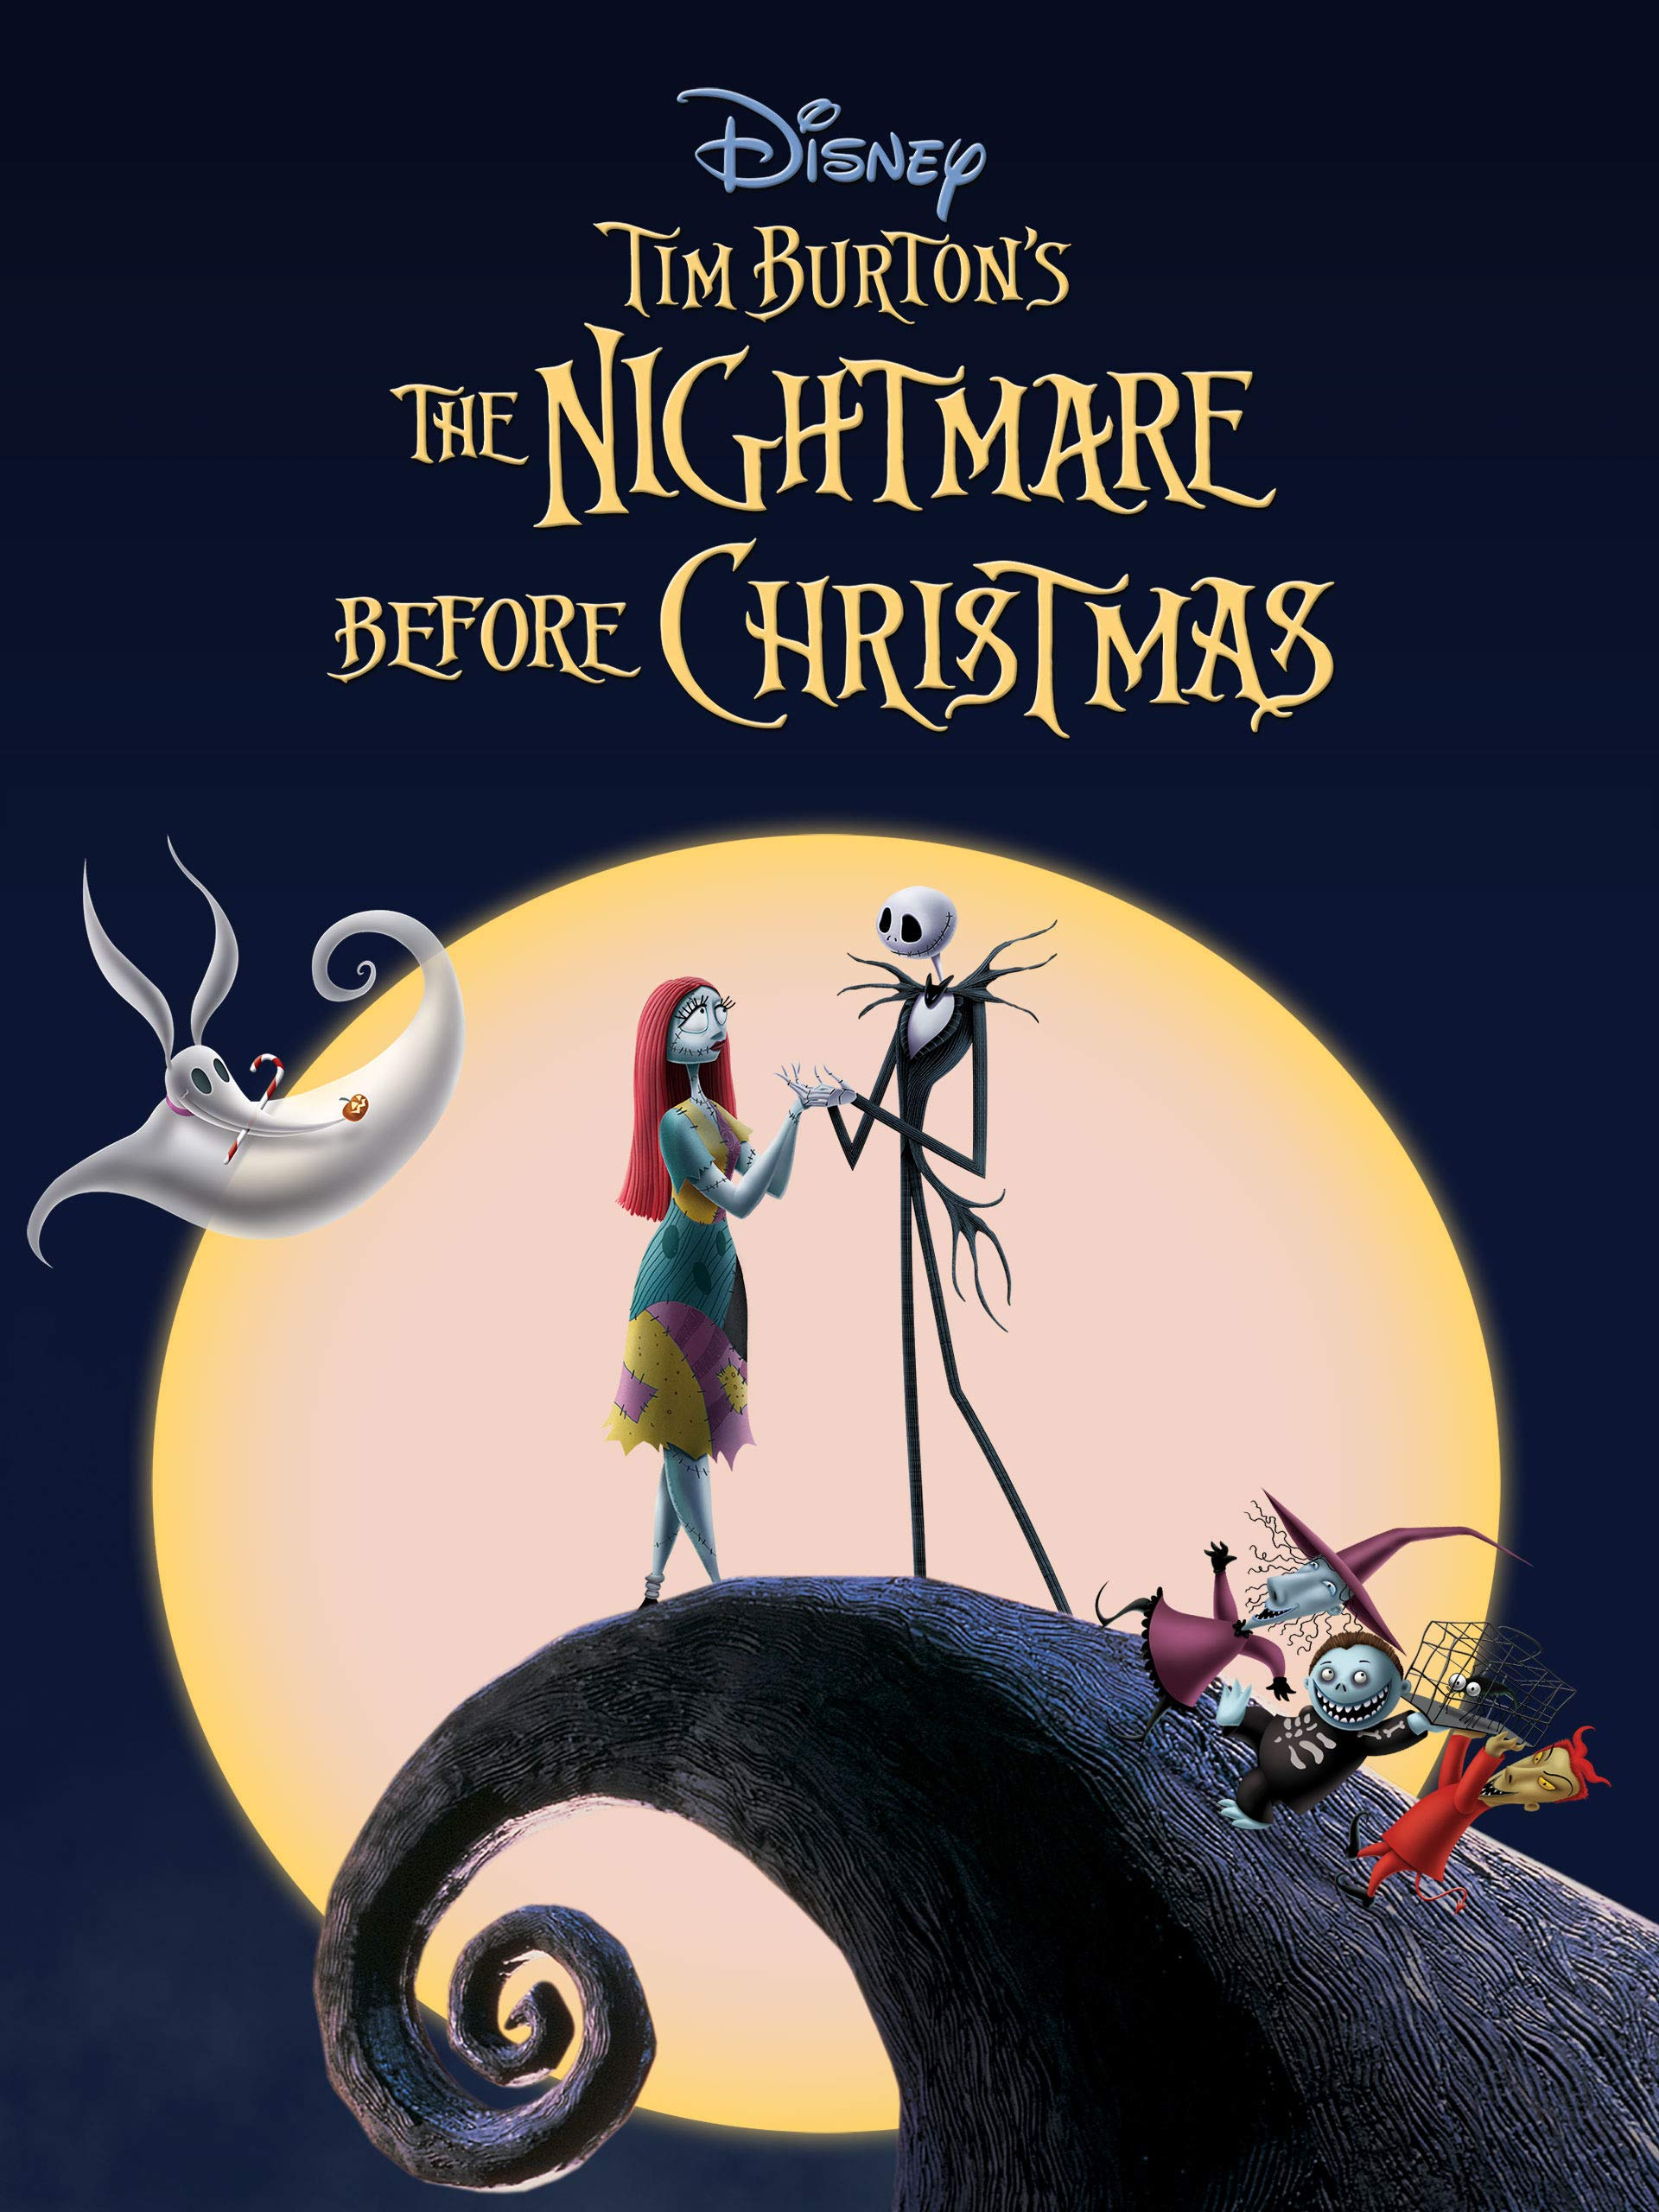 Nightmare Before Christmas Streaming 2020 Watch Tim Burton's The Nightmare Before Christmas | Prime Video